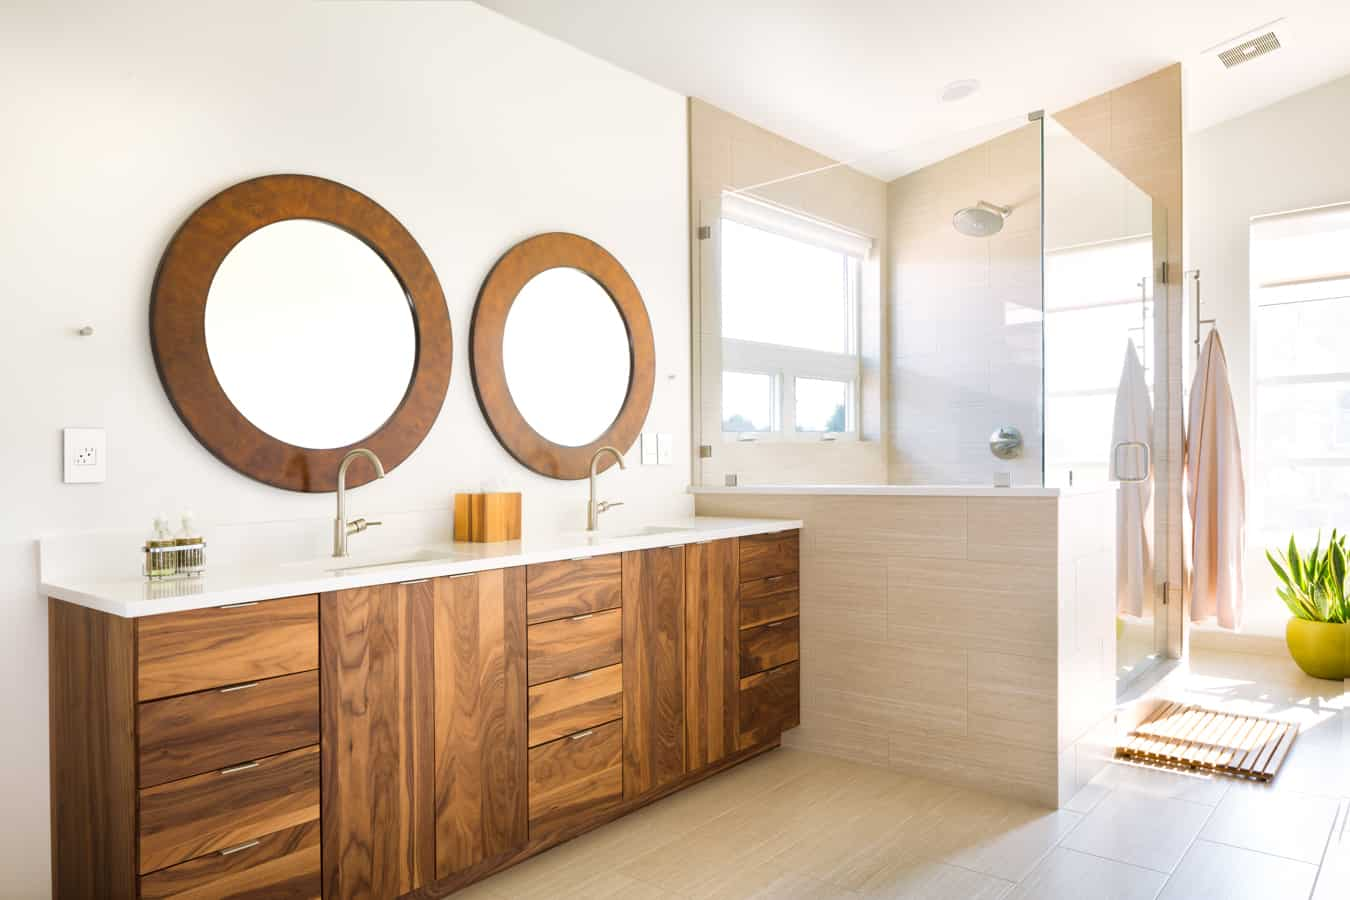 Master Bath Remodel Planning - Spa like